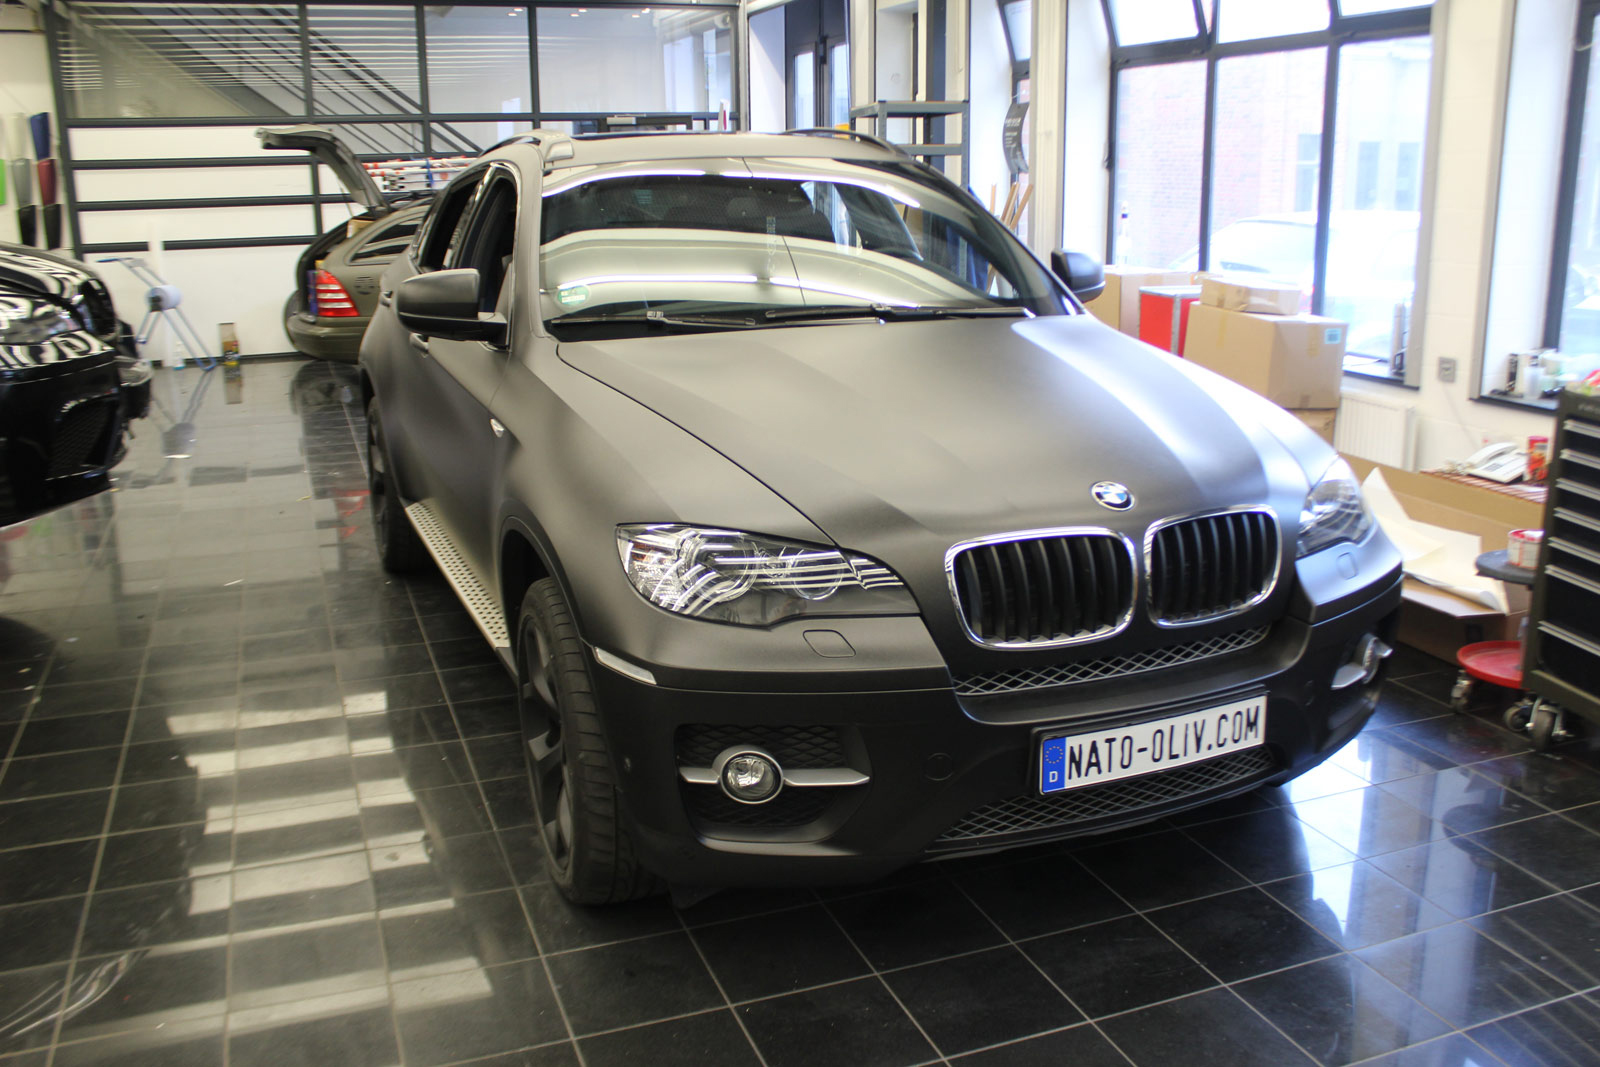 BMW_X6_FOLIERUNG_SCHWARZ_METALLIC_MATT_02